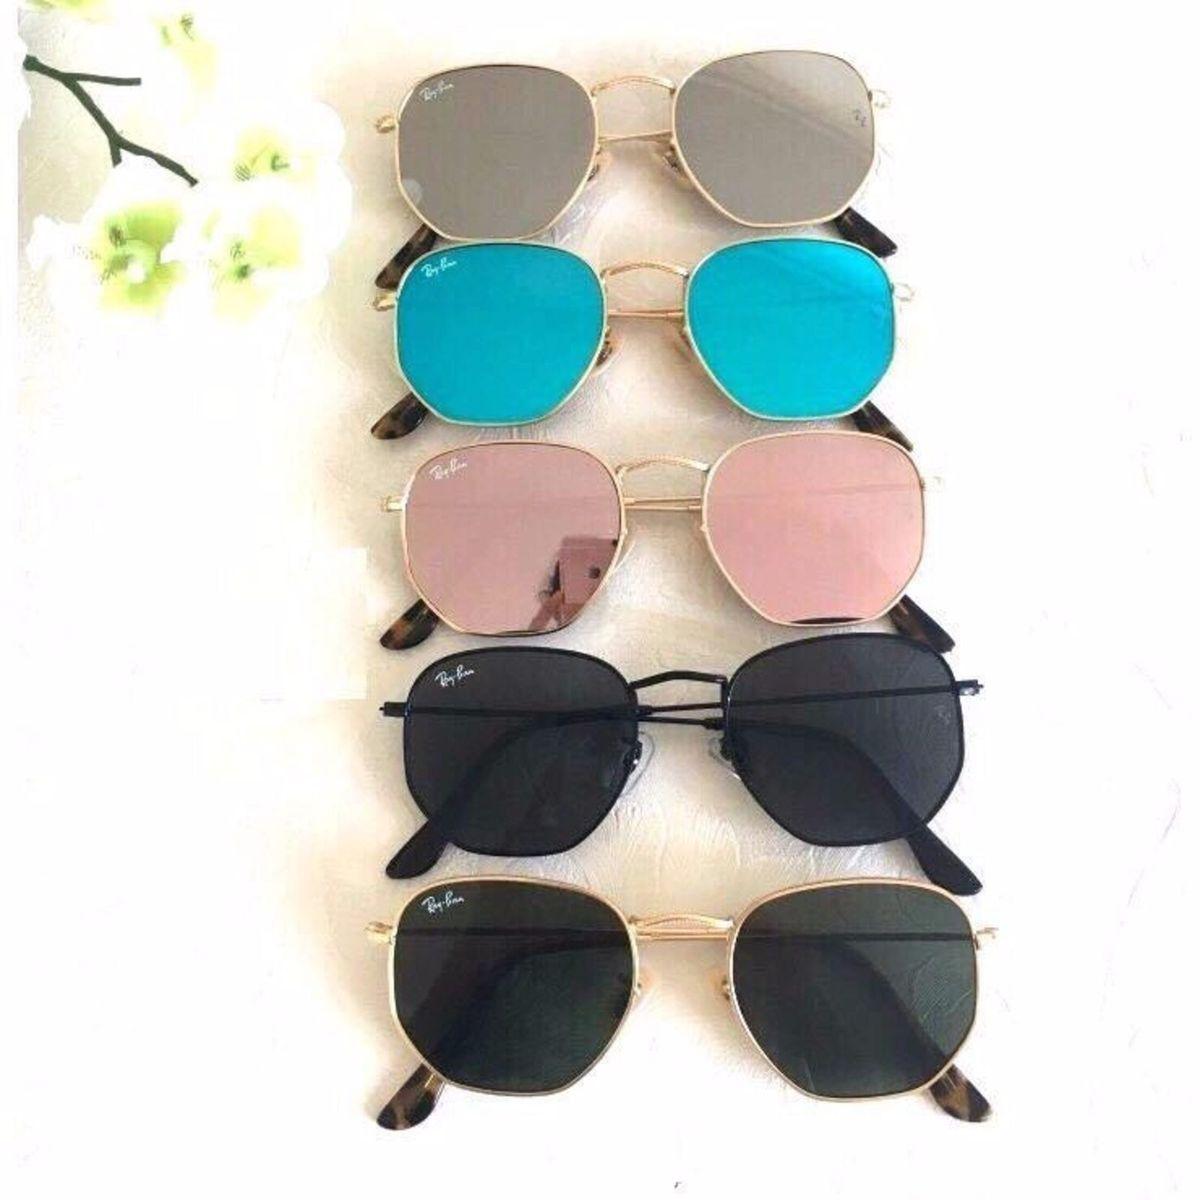 Óculos Rayban Hexagonal Cores Exclusivas   Óculos Feminino Ray Ban ... 061687dc59